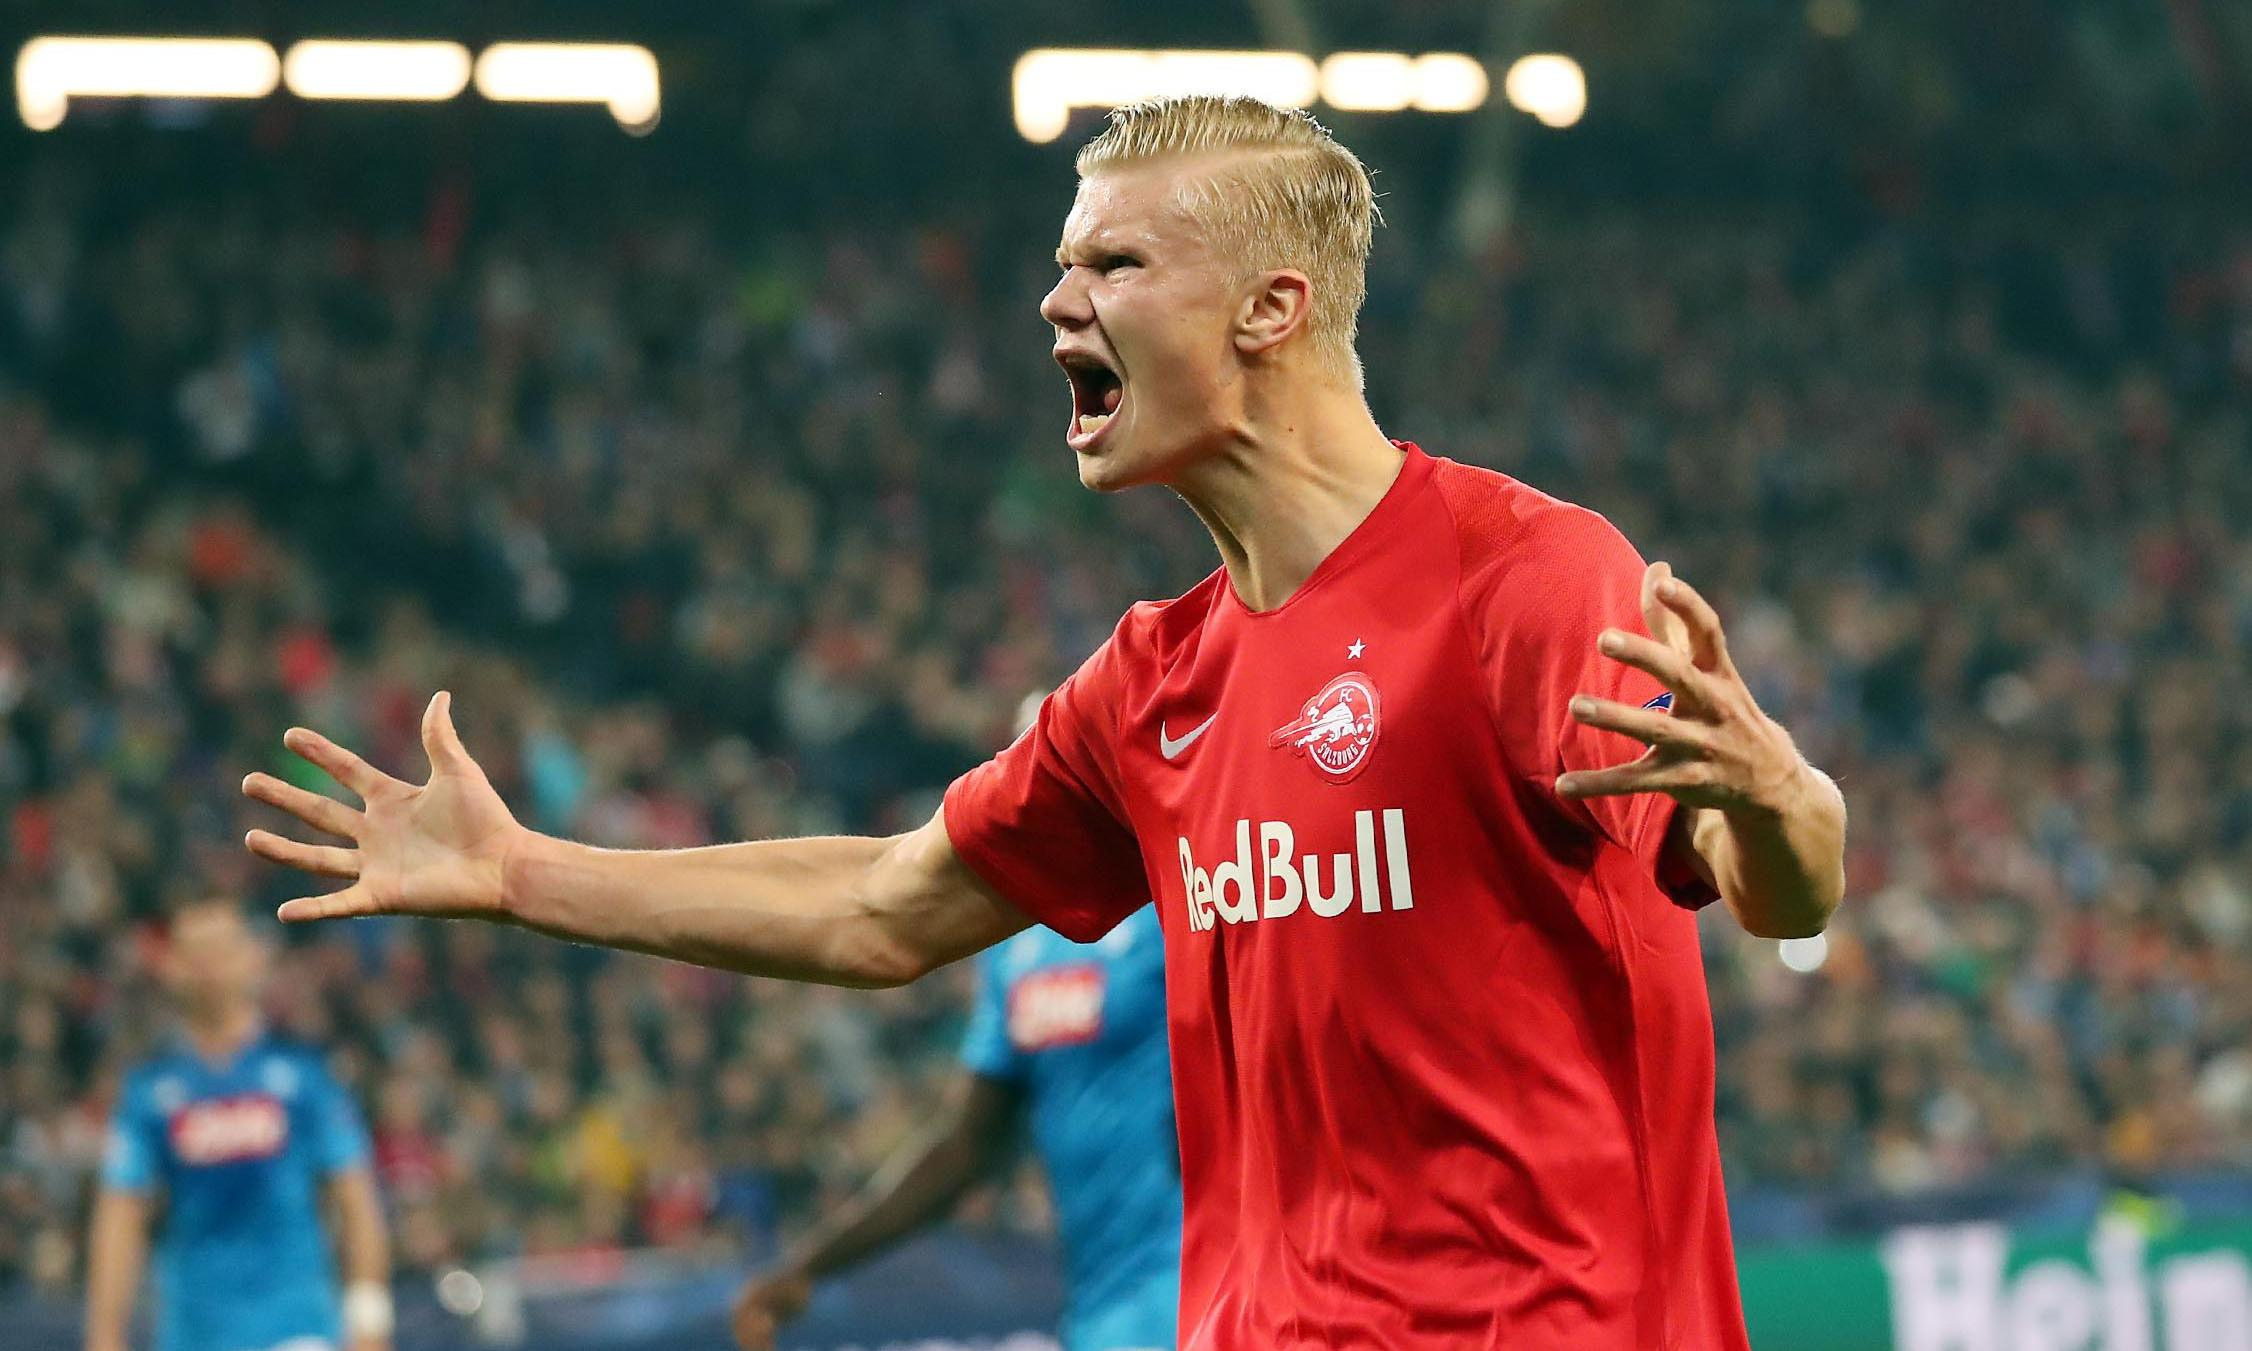 Football transfer rumours: Erling Braut Haaland to Dortmund for £17m?